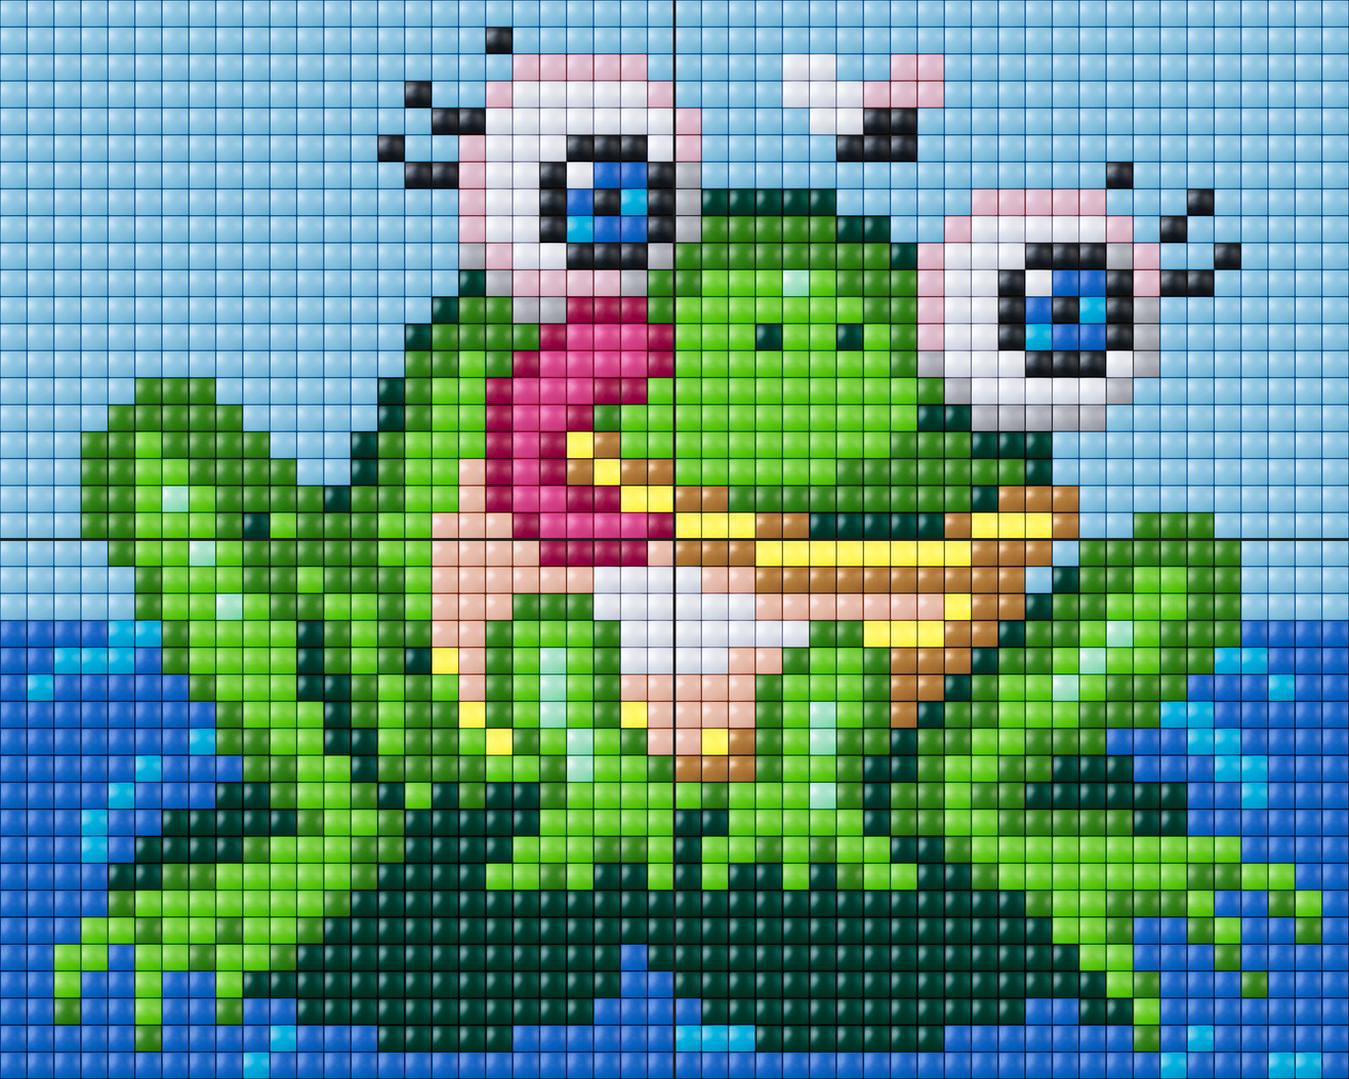 Frog_Animals_Liz_2x2P_XL.png